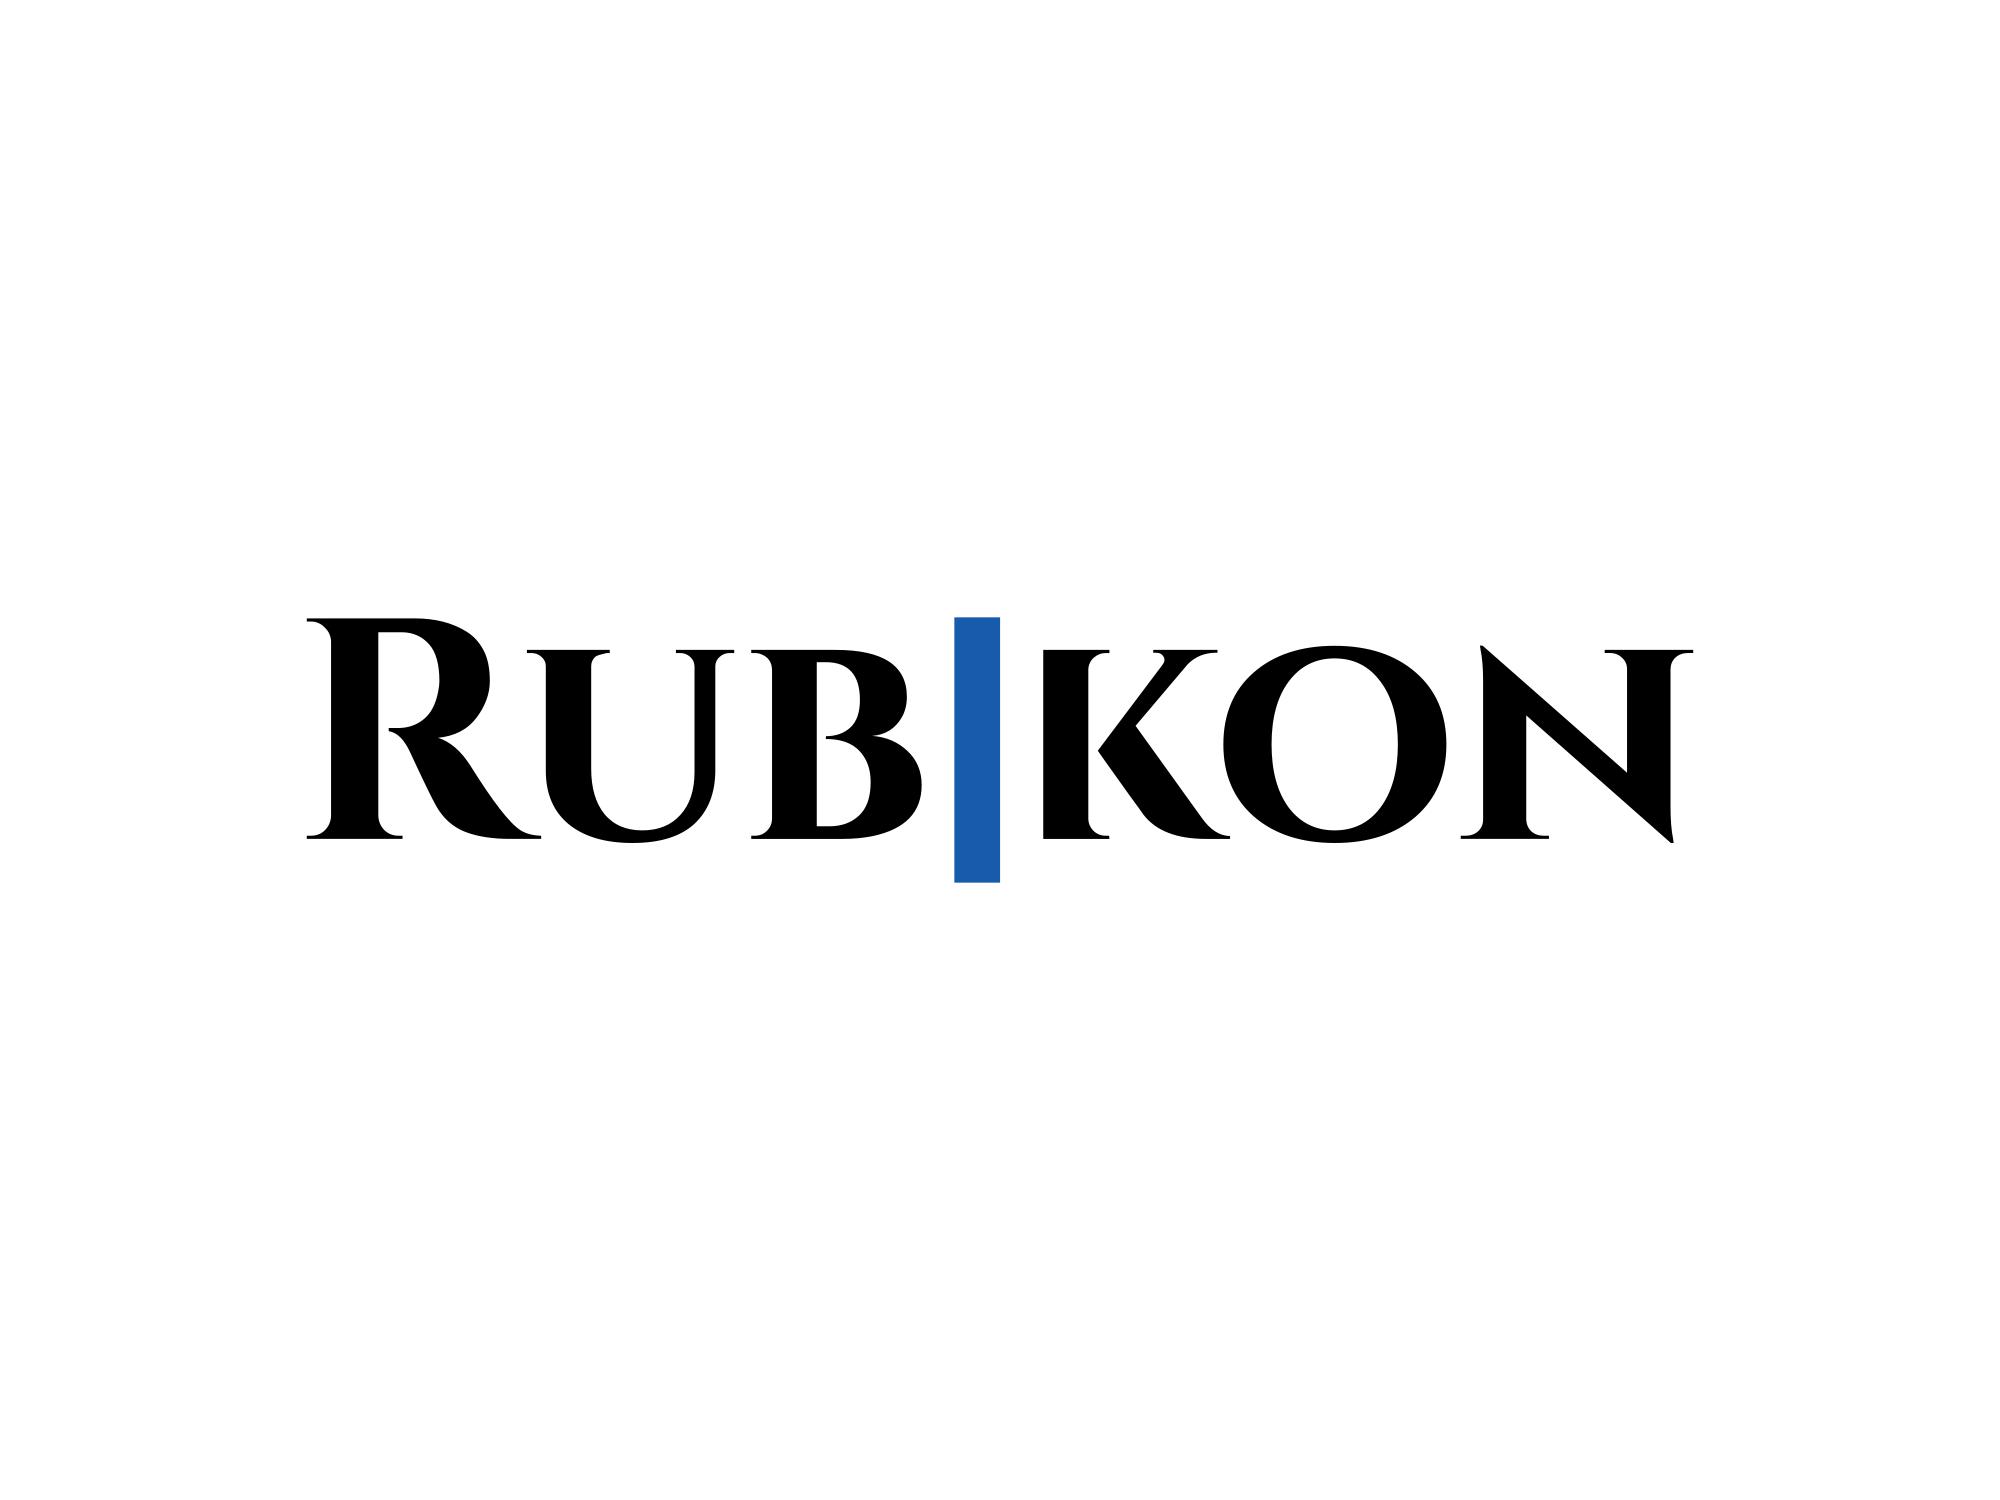 Rubikon-Schrift